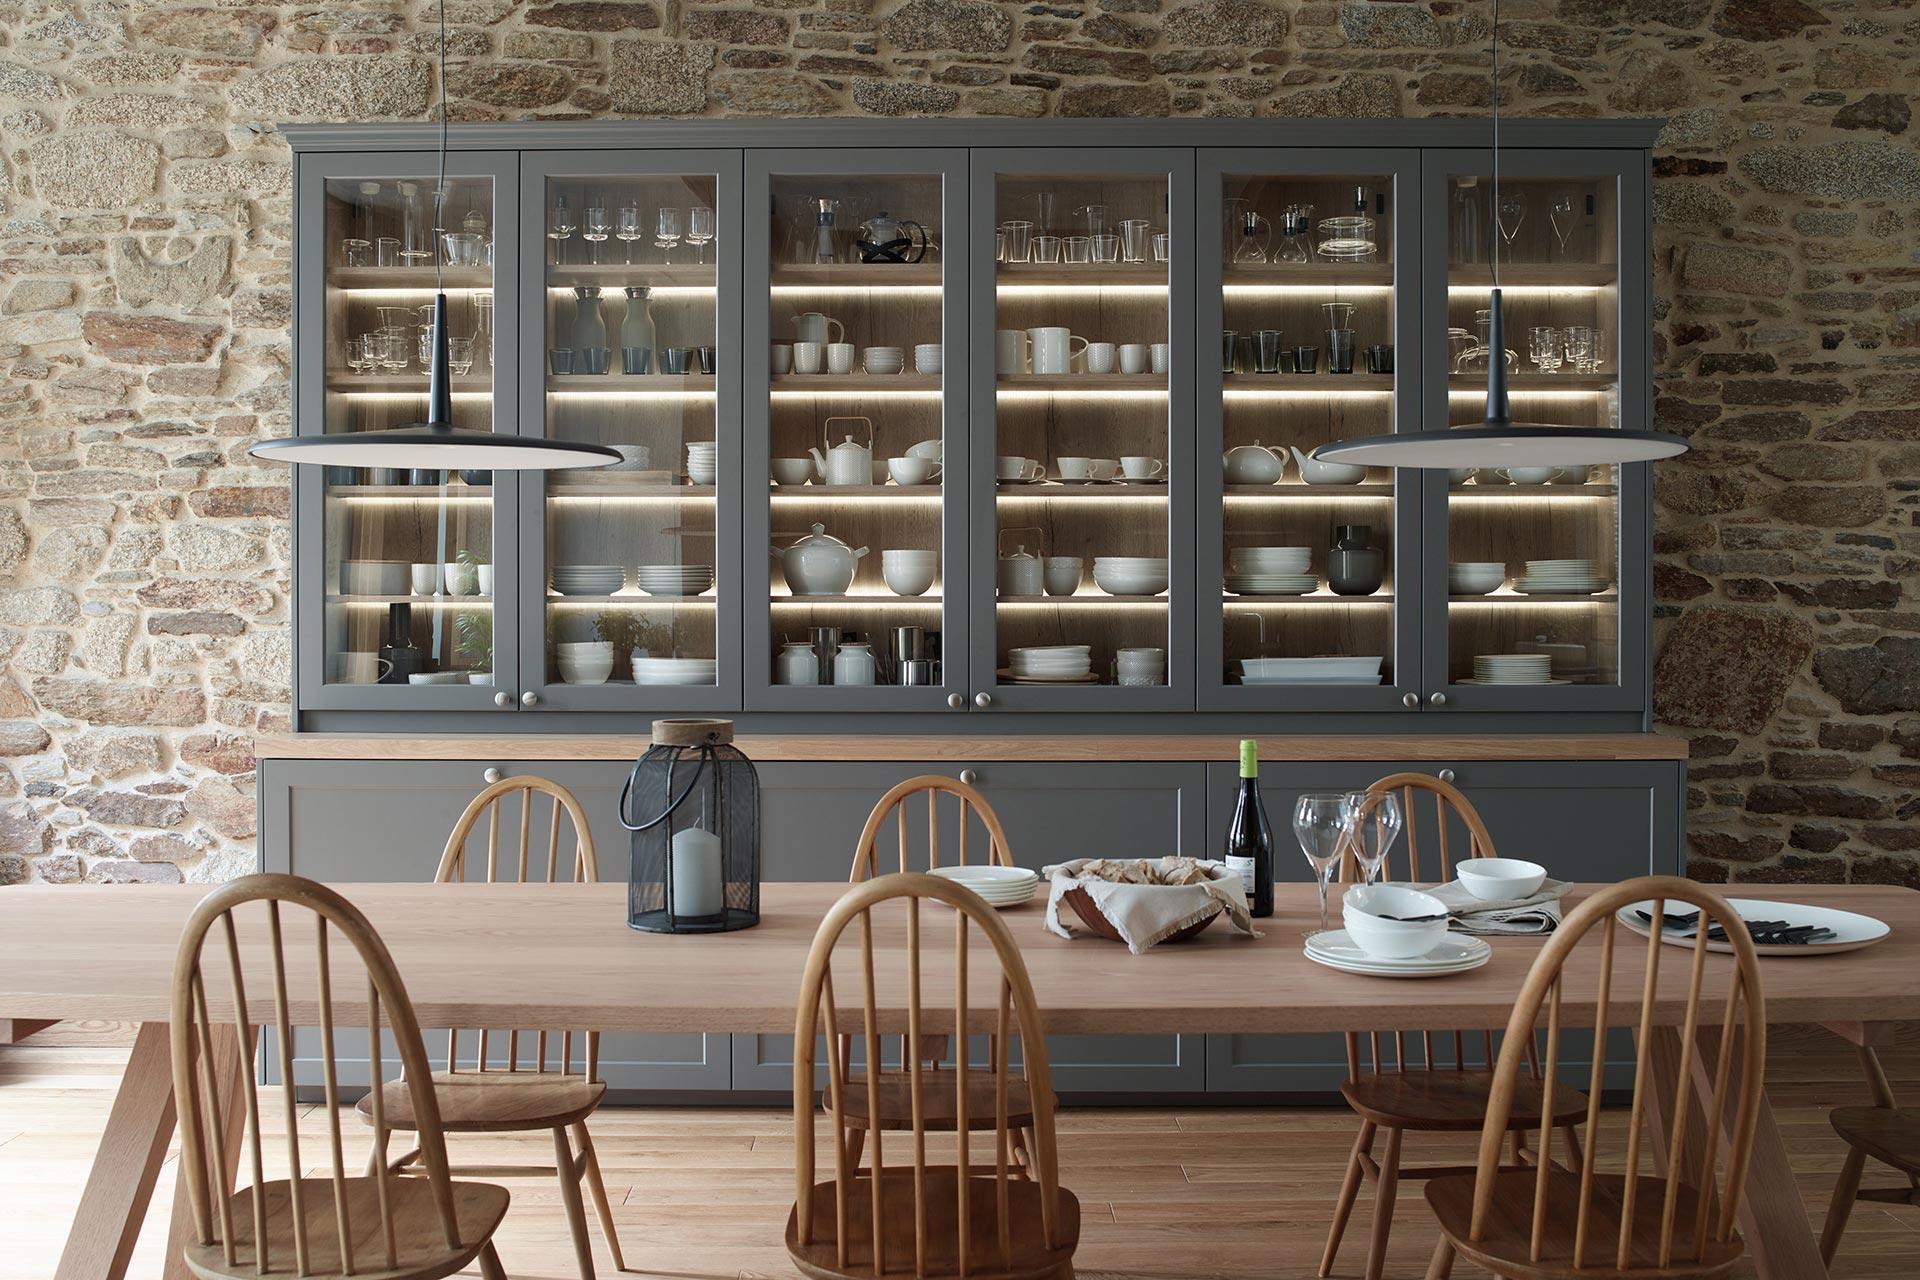 mueble-vitrina.aparador-paneles-led-integrado-cocina-y-salon-santos